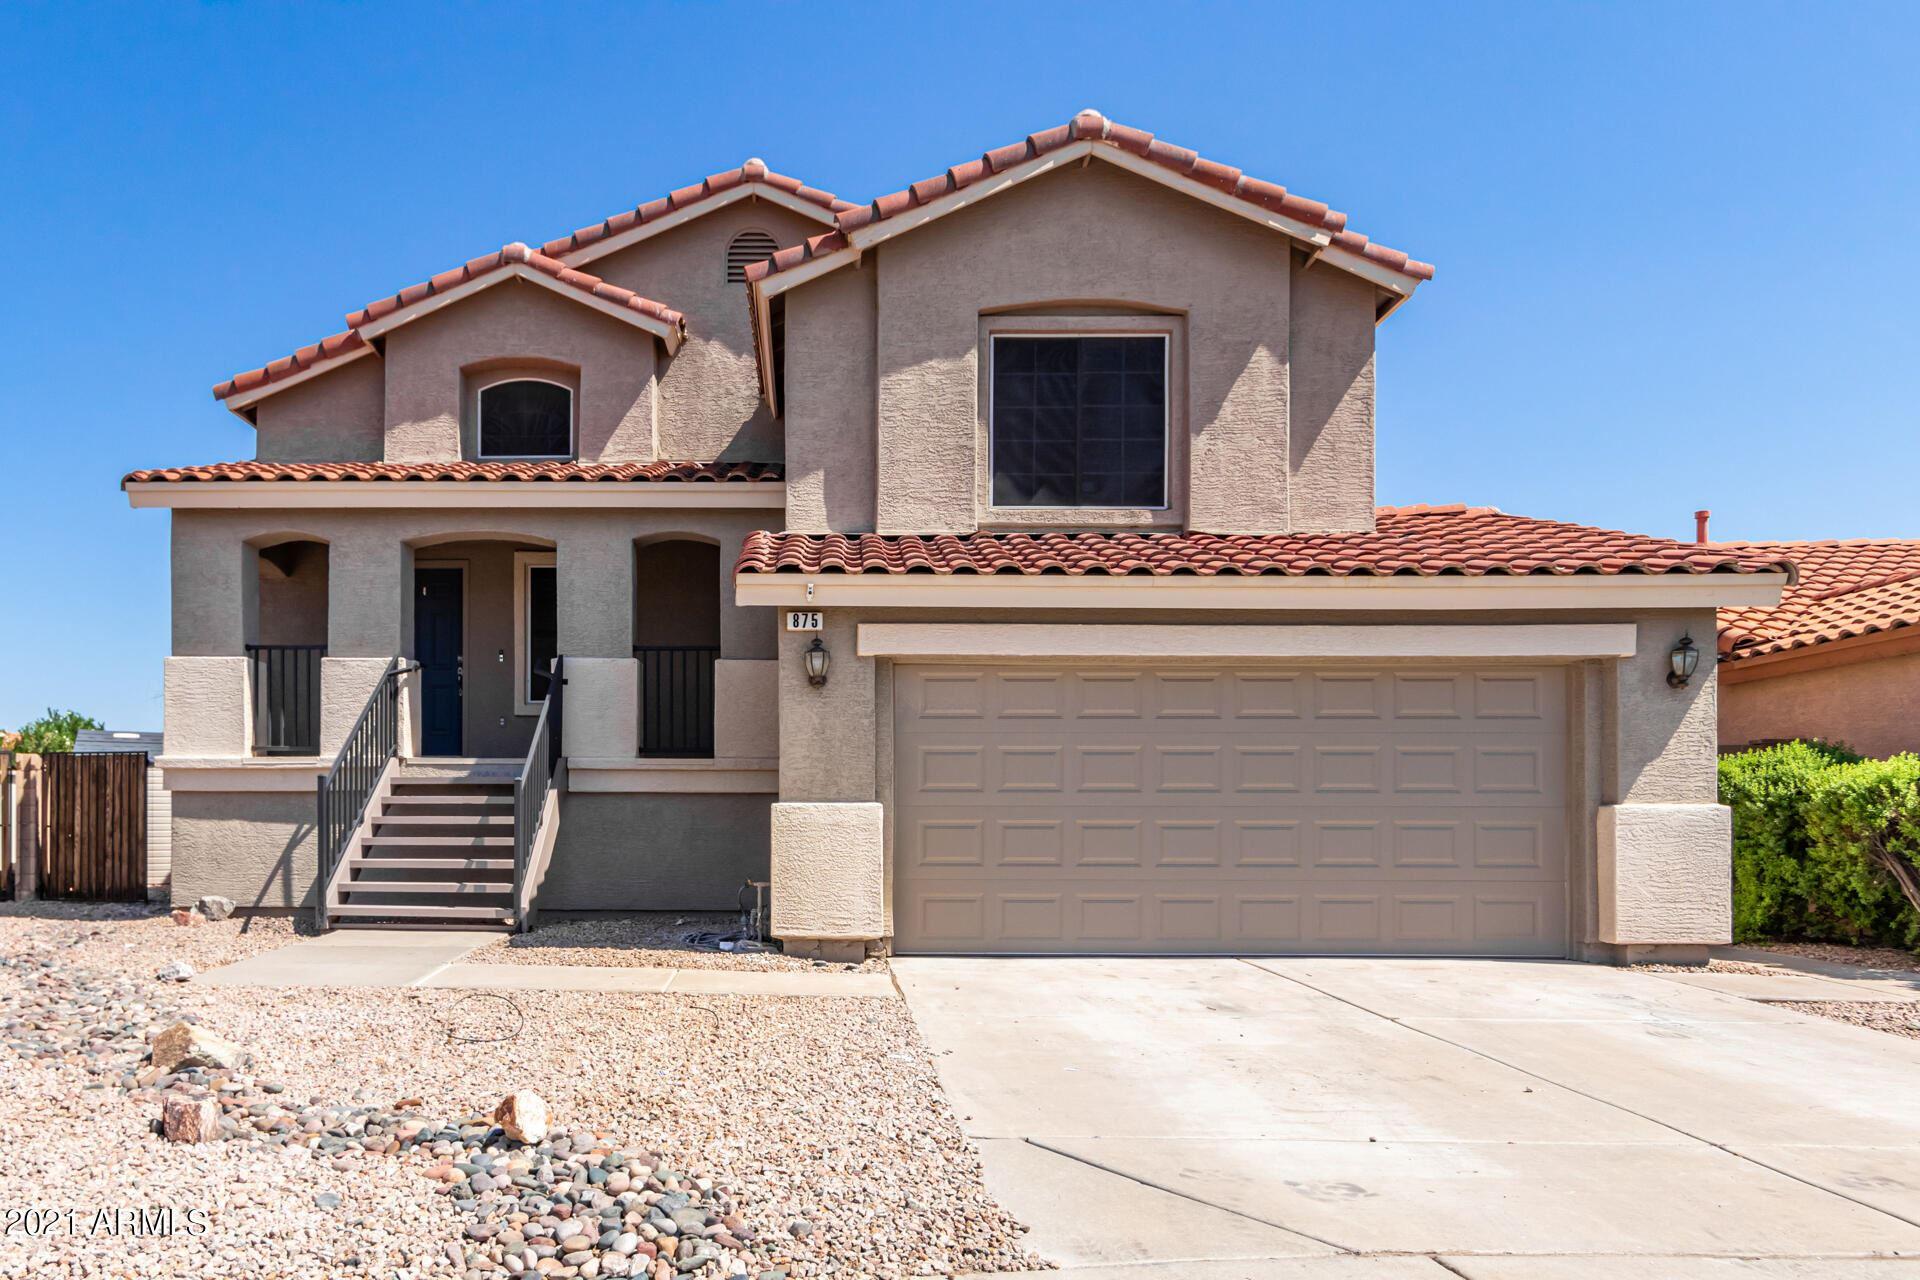 875 N ITHICA Court, Chandler, AZ 85225 - MLS#: 6297705